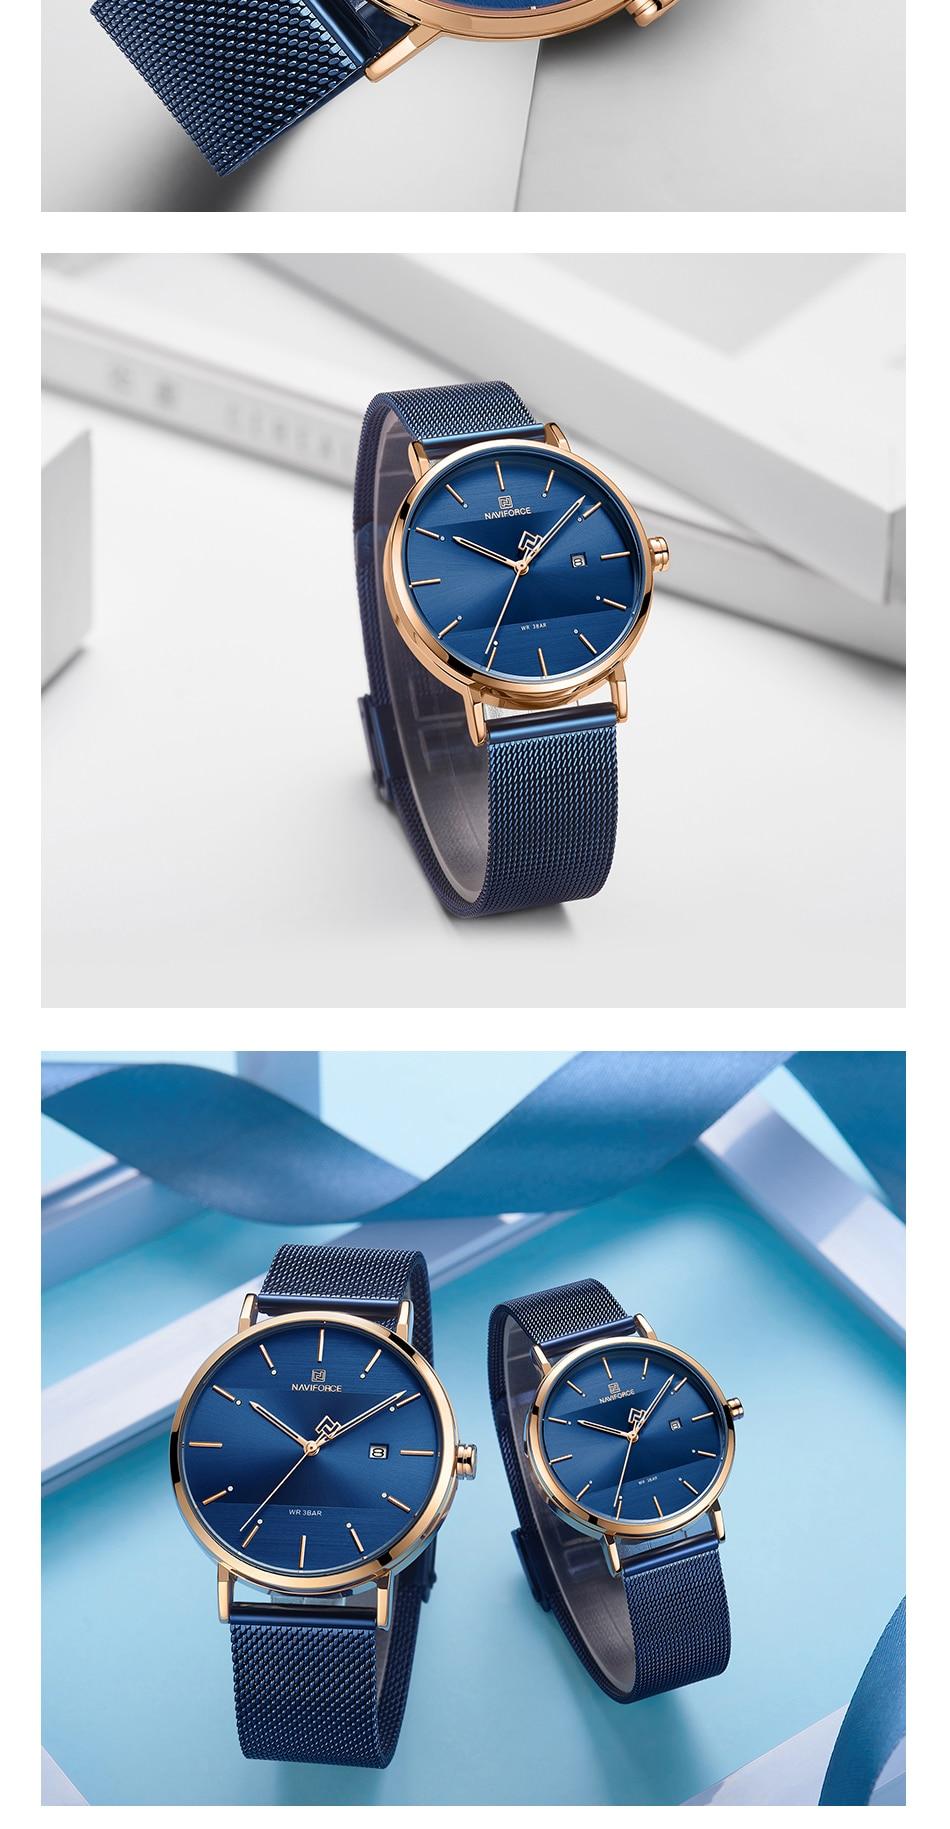 NAVIFORCE-New-Stylish-Women-Watches-Top-Brand-Luxury-Stainless-Steel-Strap-Quartz-Wristwatch-For-Woman-Bracelet-Watch-2019-Gift--(16)_02